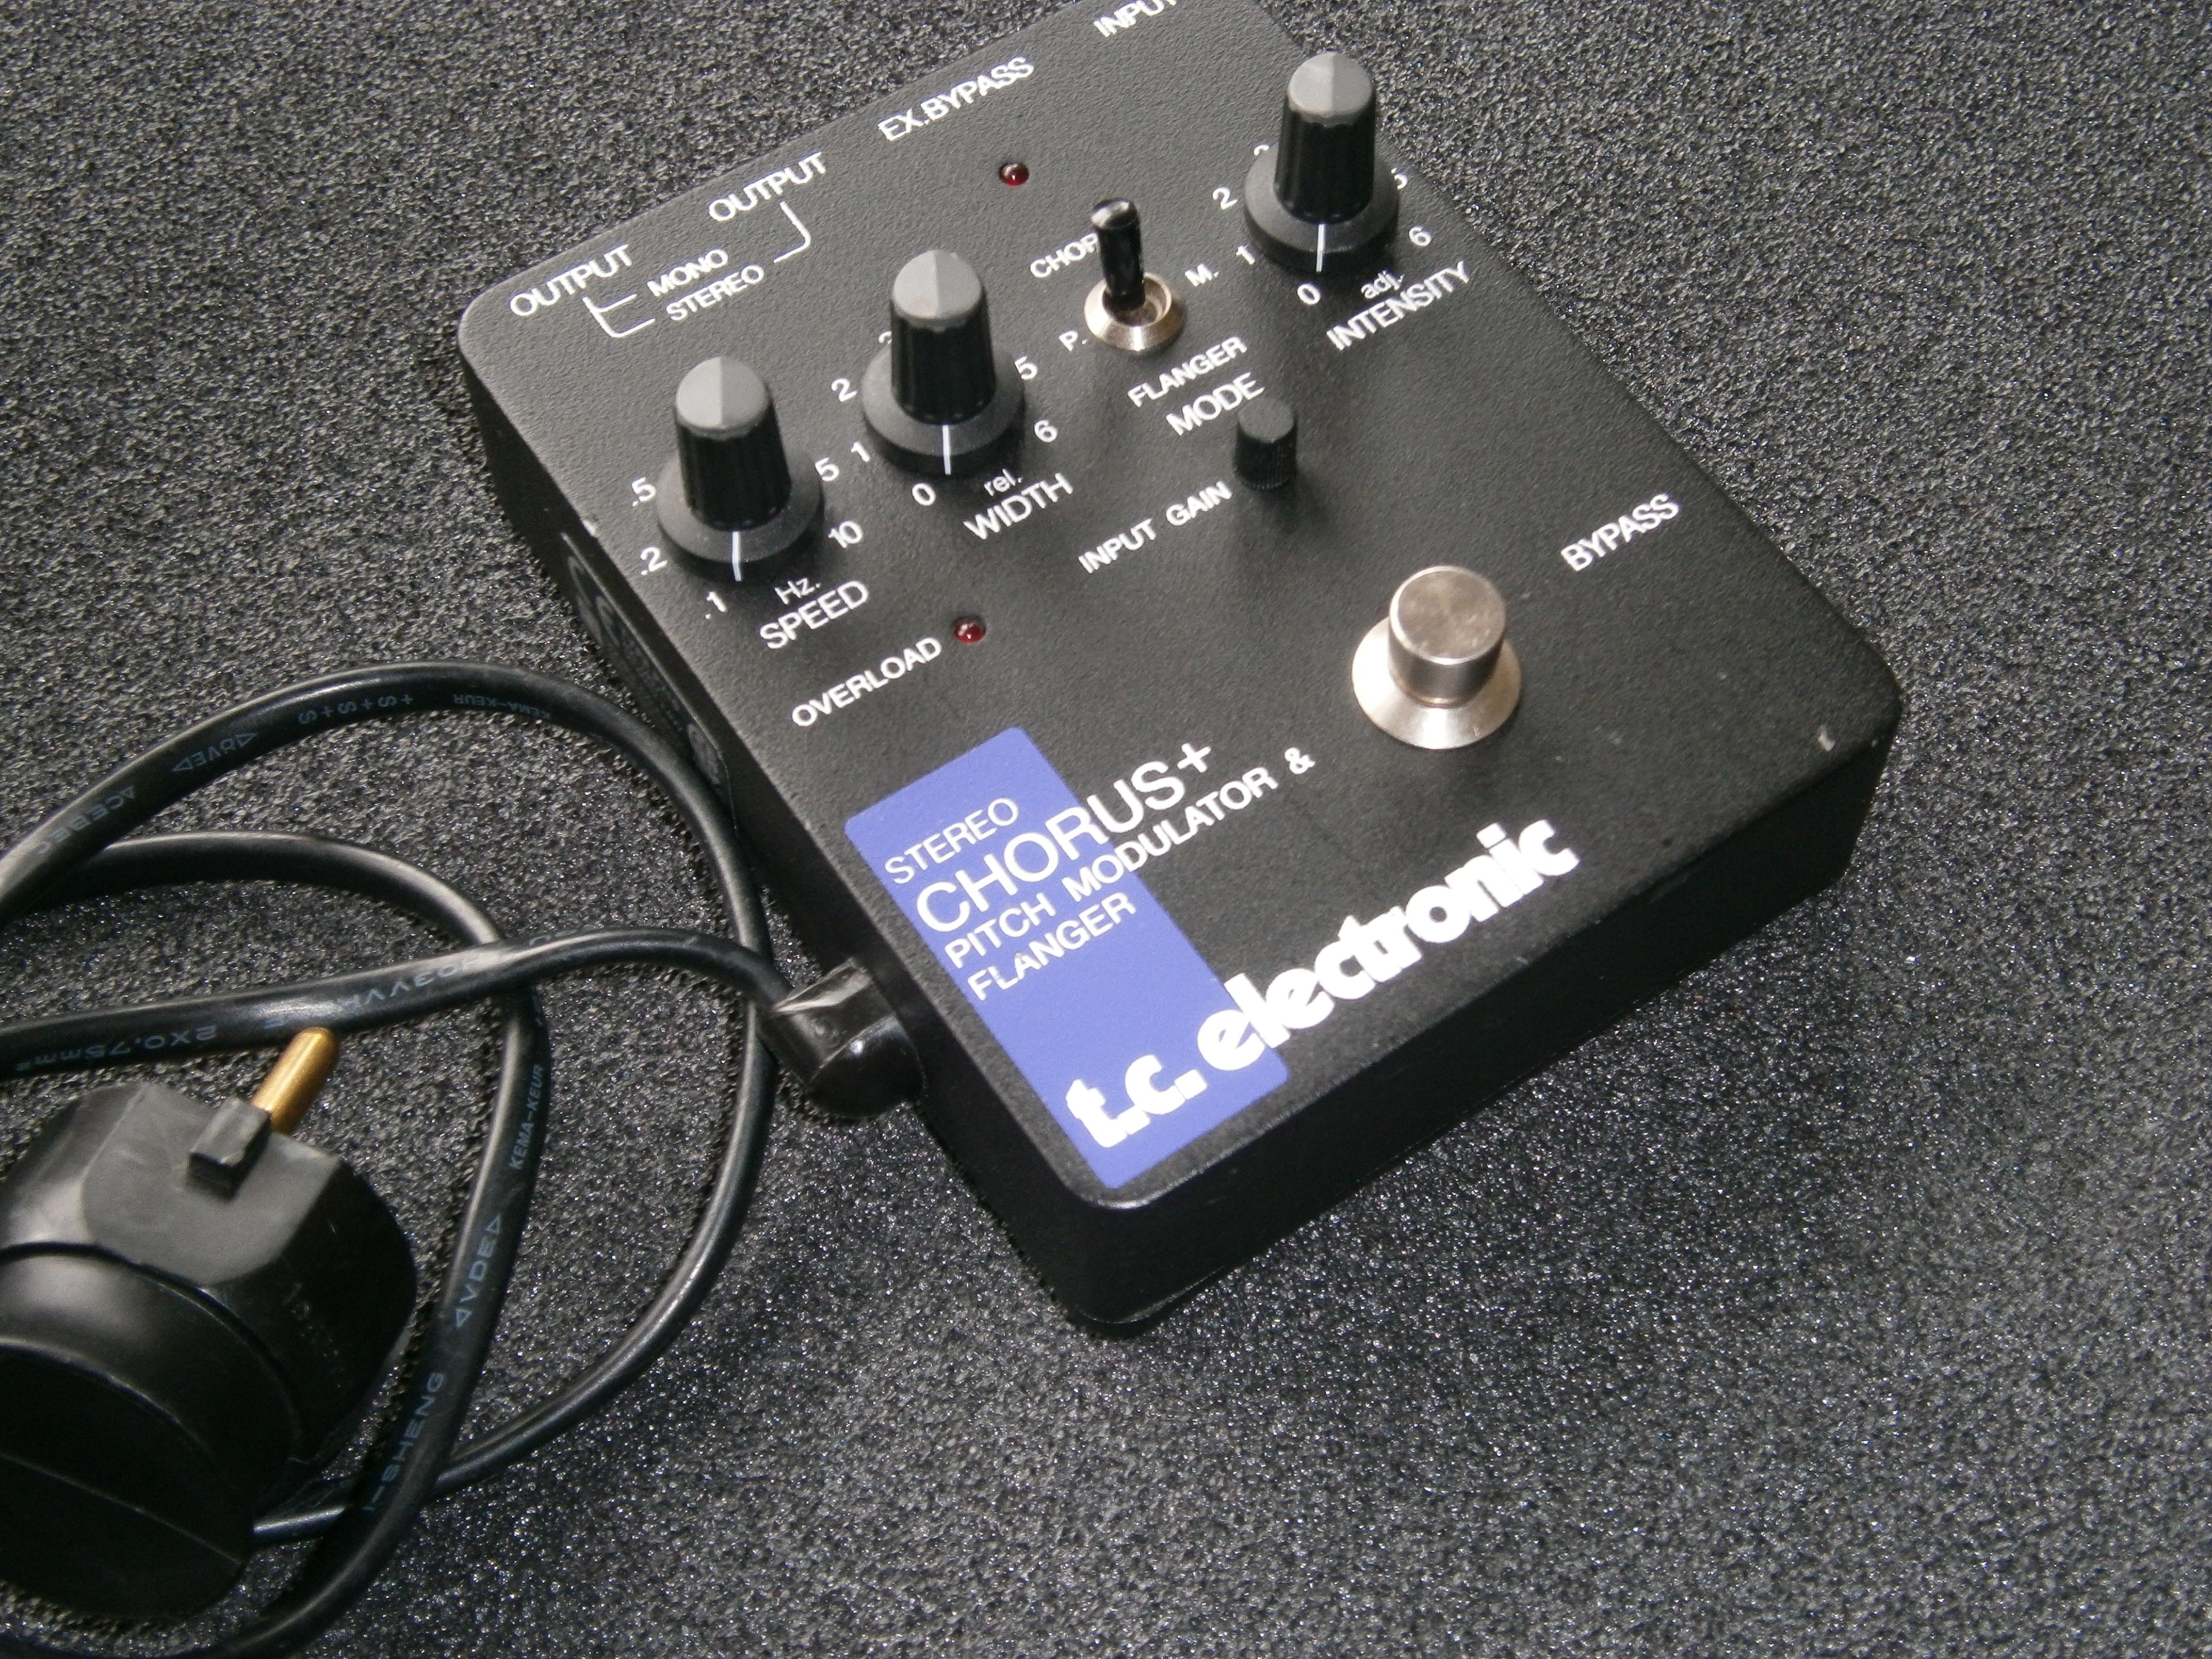 https://medias.audiofanzine.com/images/normal/tc-electronic-scf-stereo-chorus-flanger-2200958.jpg